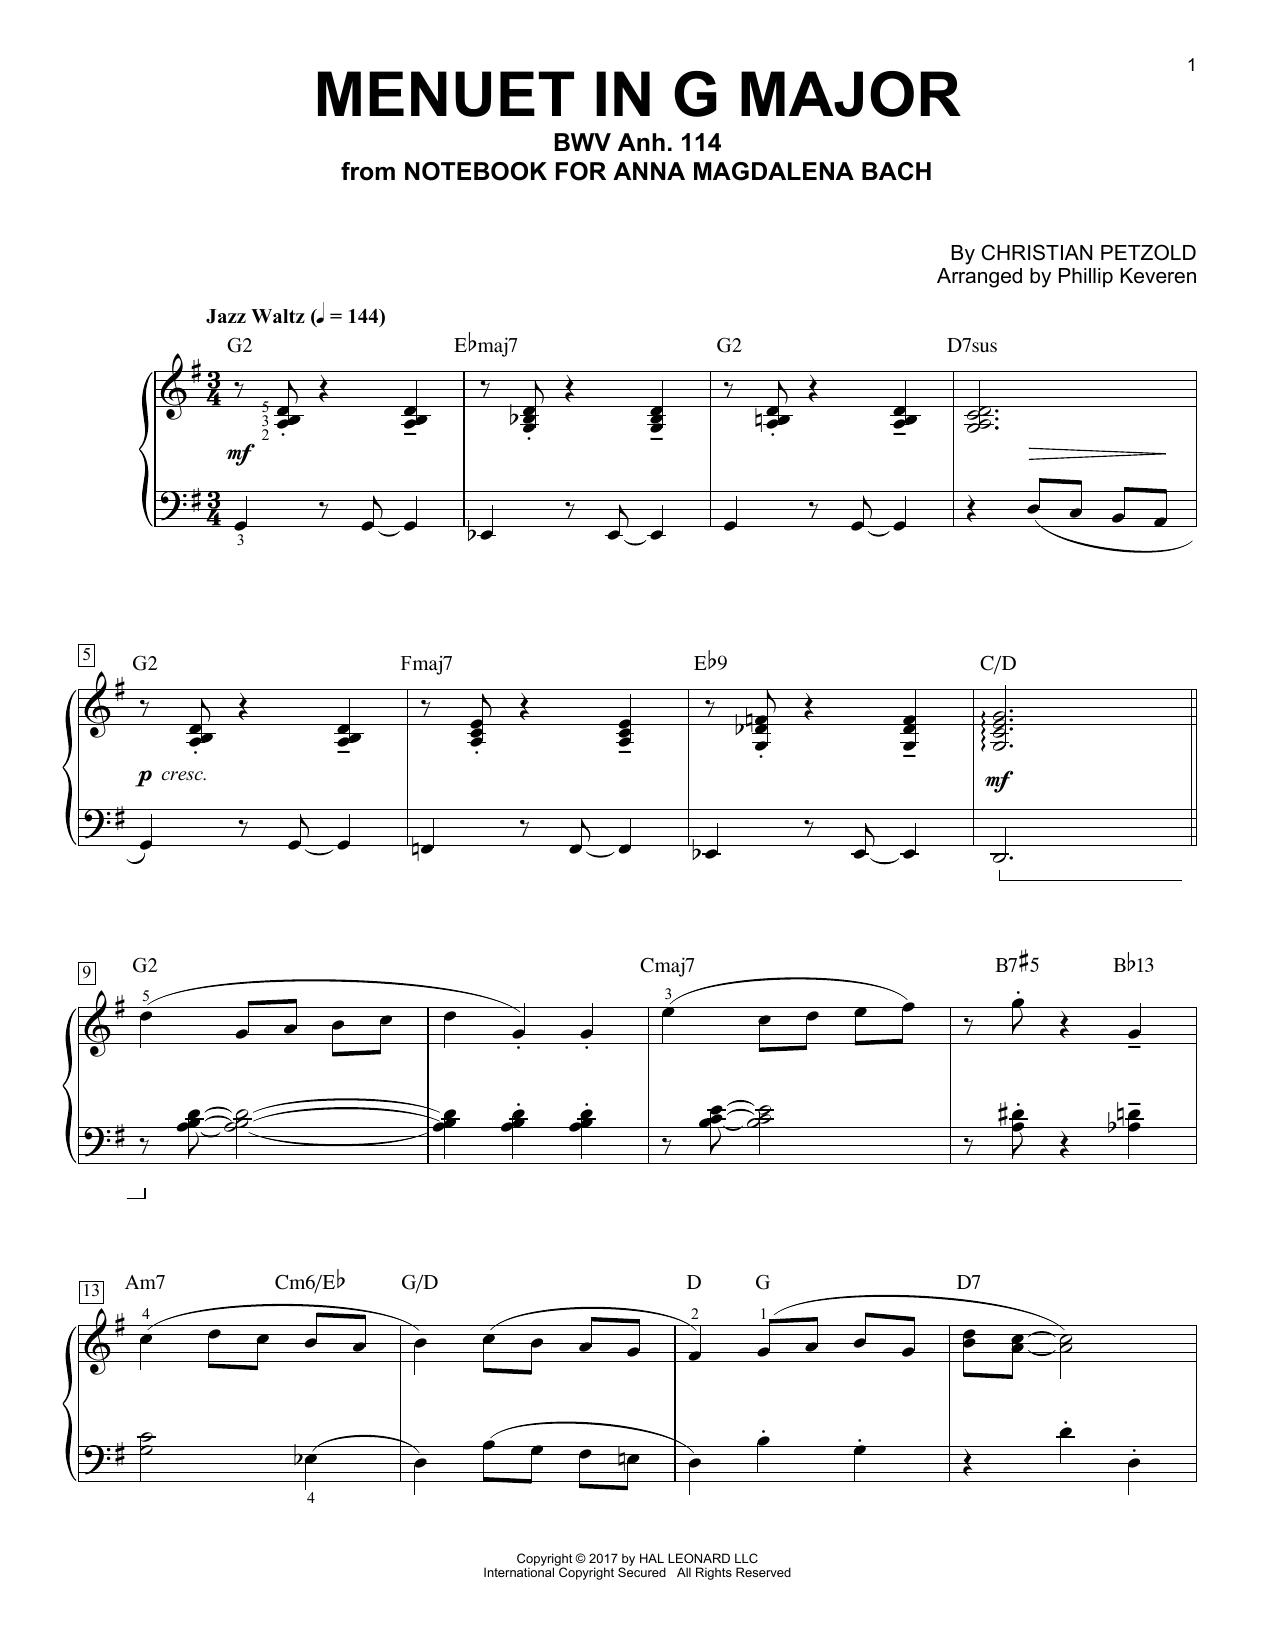 Christian Petzold Menuet In G Major, BMV Anh. 114 [Jazz version] (arr. Phillip Keveren) sheet music notes and chords. Download Printable PDF.